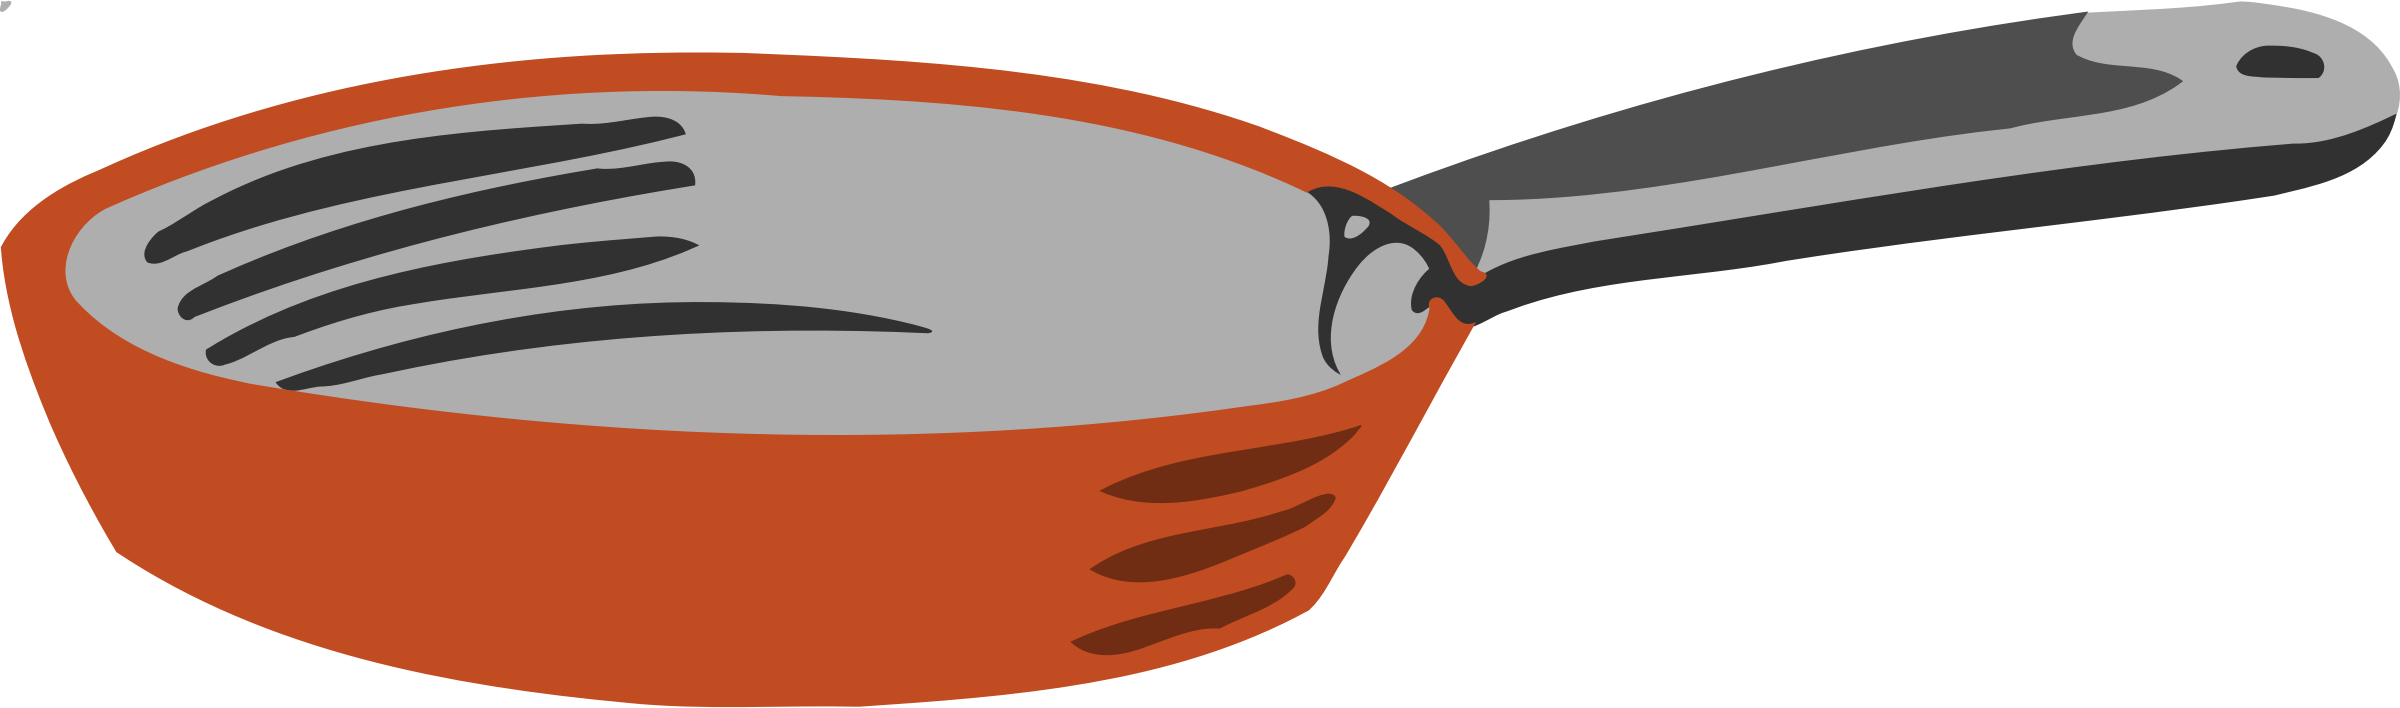 Frying pan utensil clip. Fries clipart kitchen tool